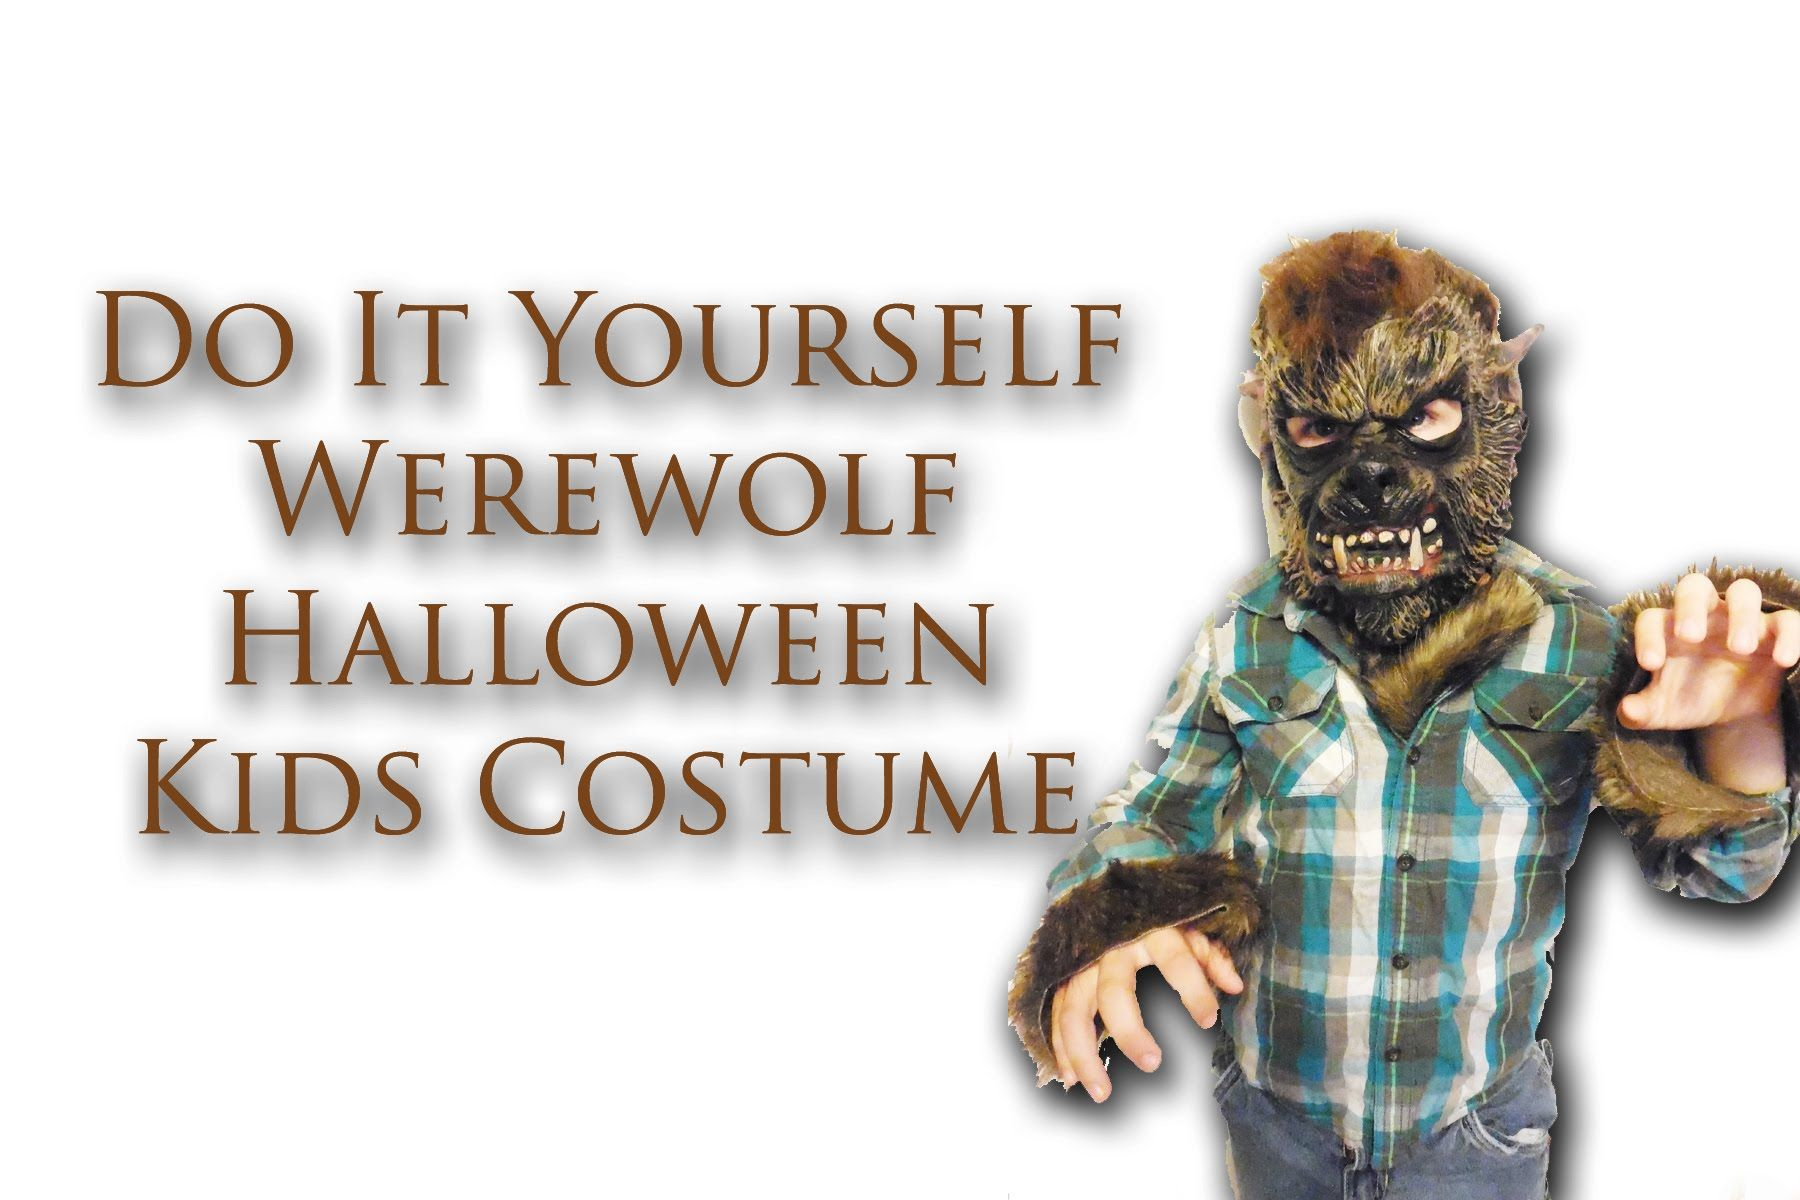 Diy easy kids werewolf costume stop the pin sanity tis the diy easy kids werewolf costume stop the pin sanity solutioingenieria Images